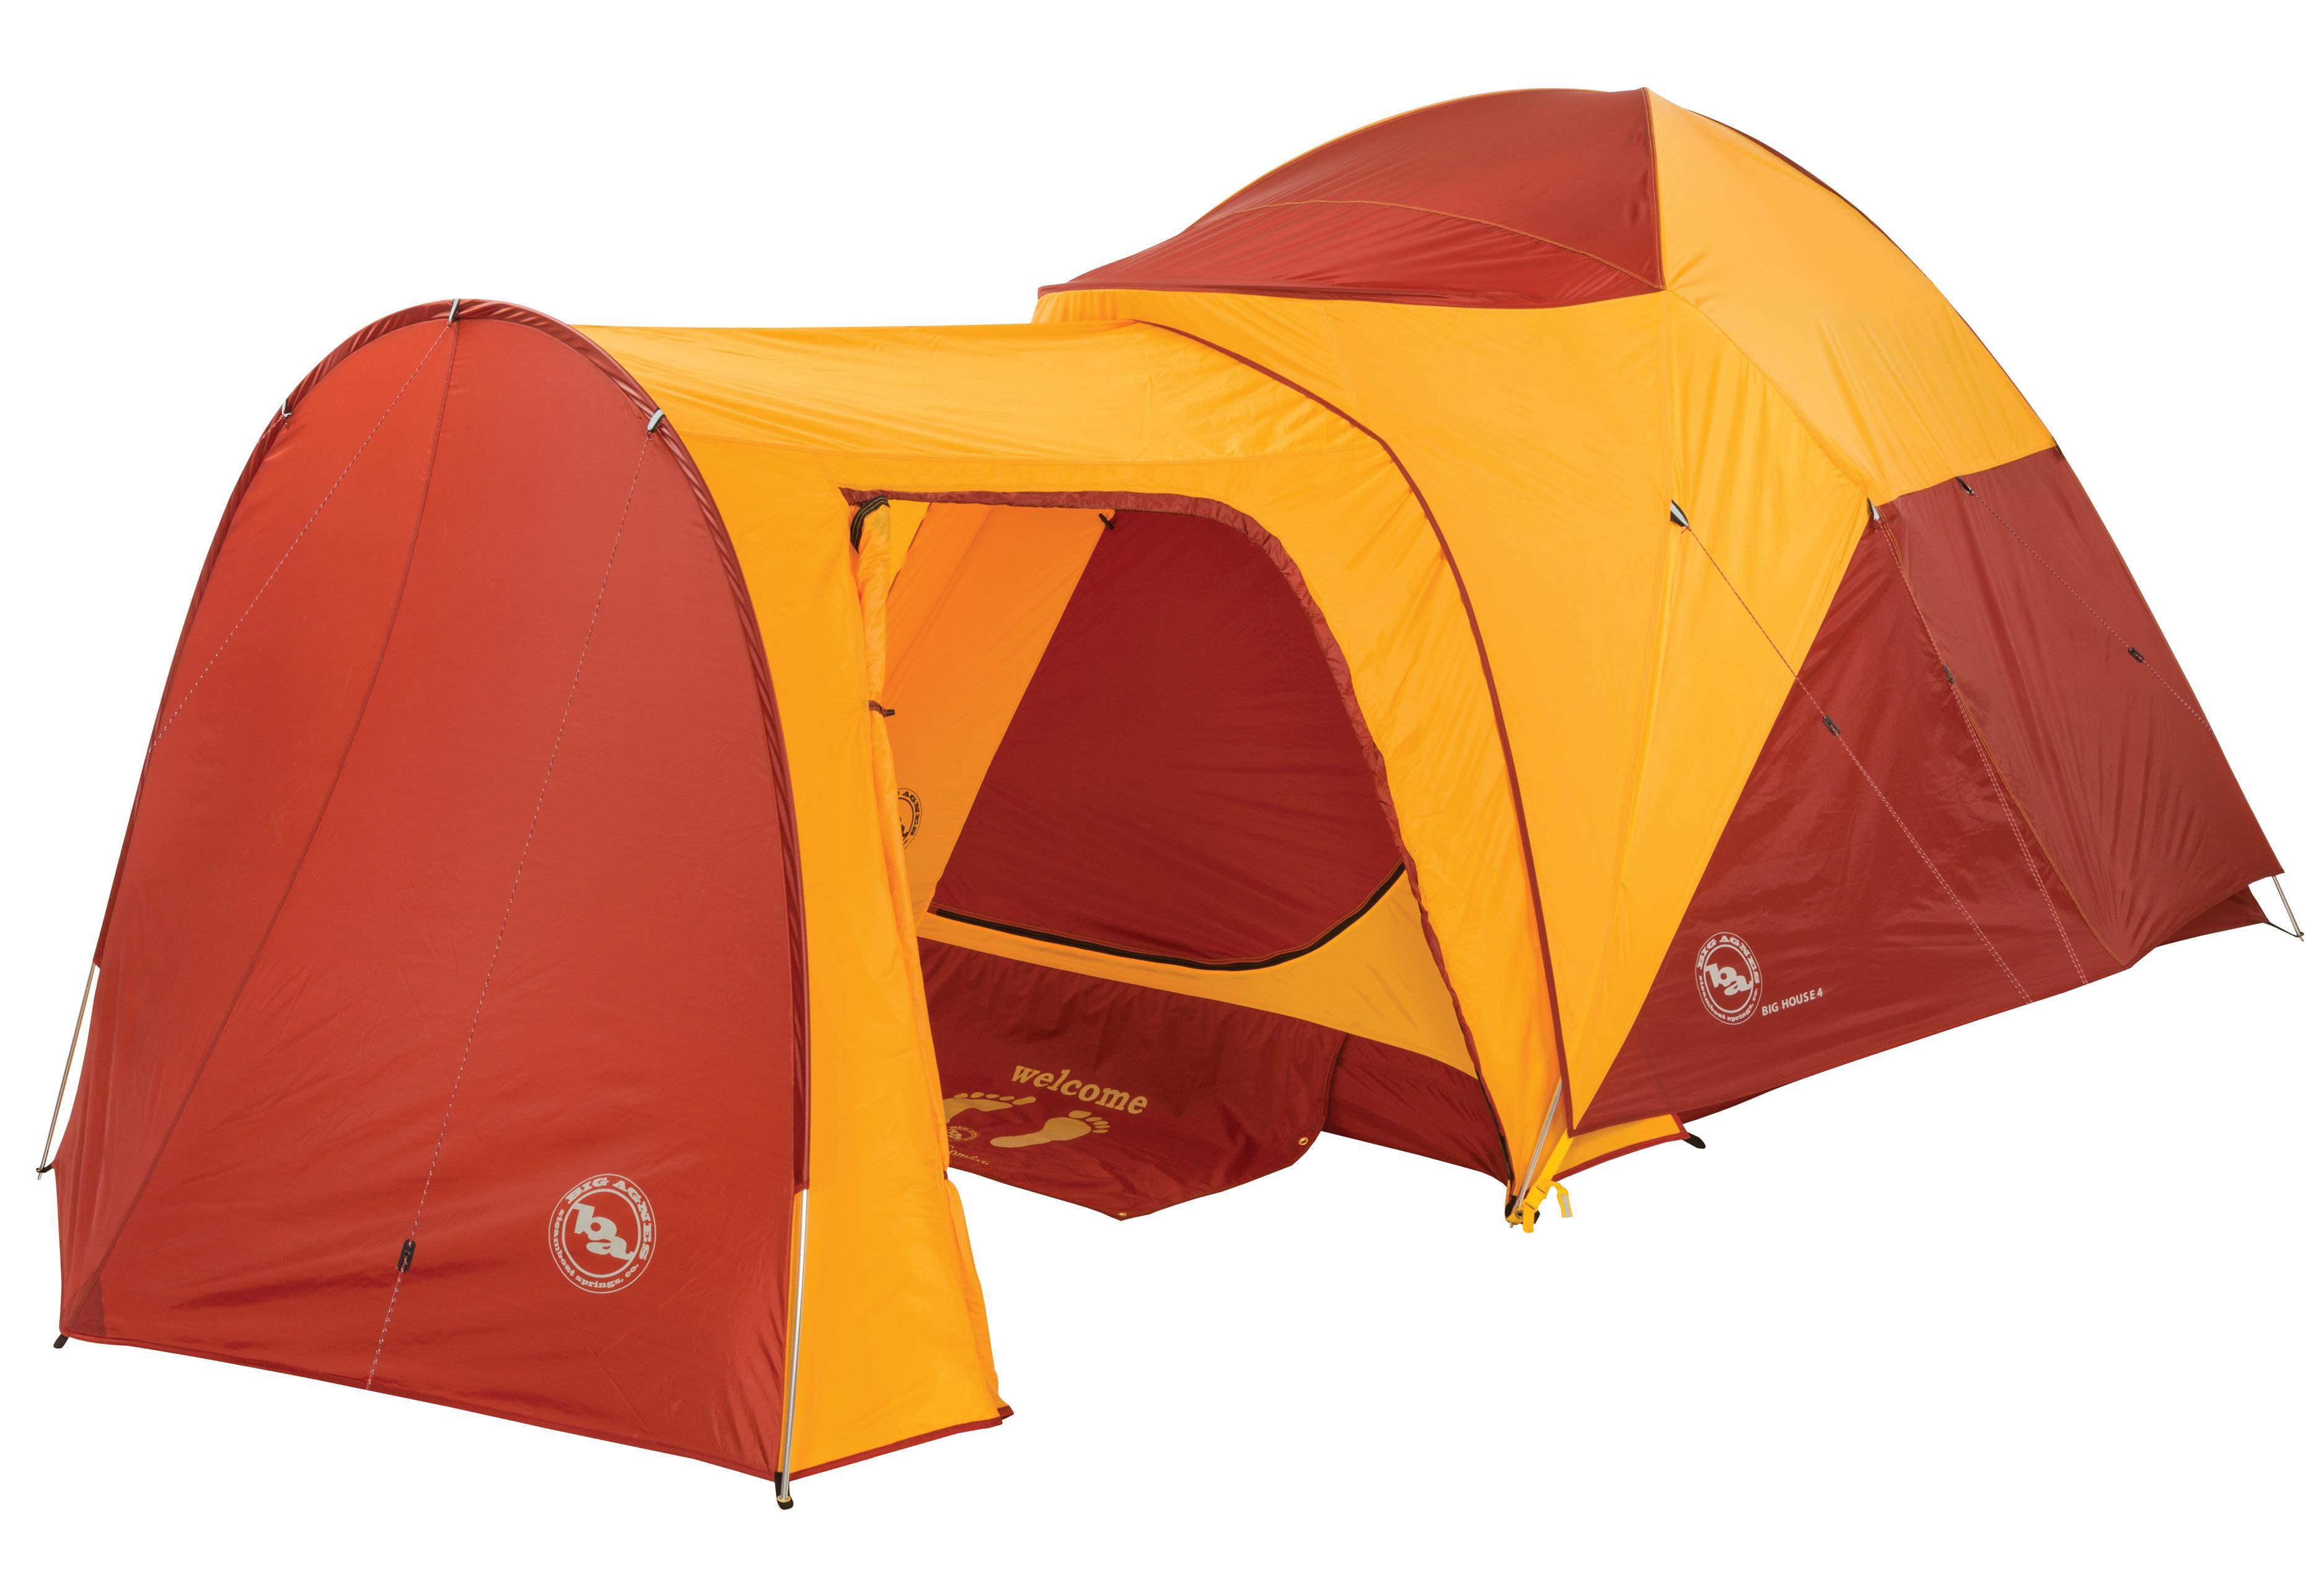 Help  sc 1 st  eBay & Big Agnes Big House 4 Person 3 Season Camping Tent TBH414 | eBay